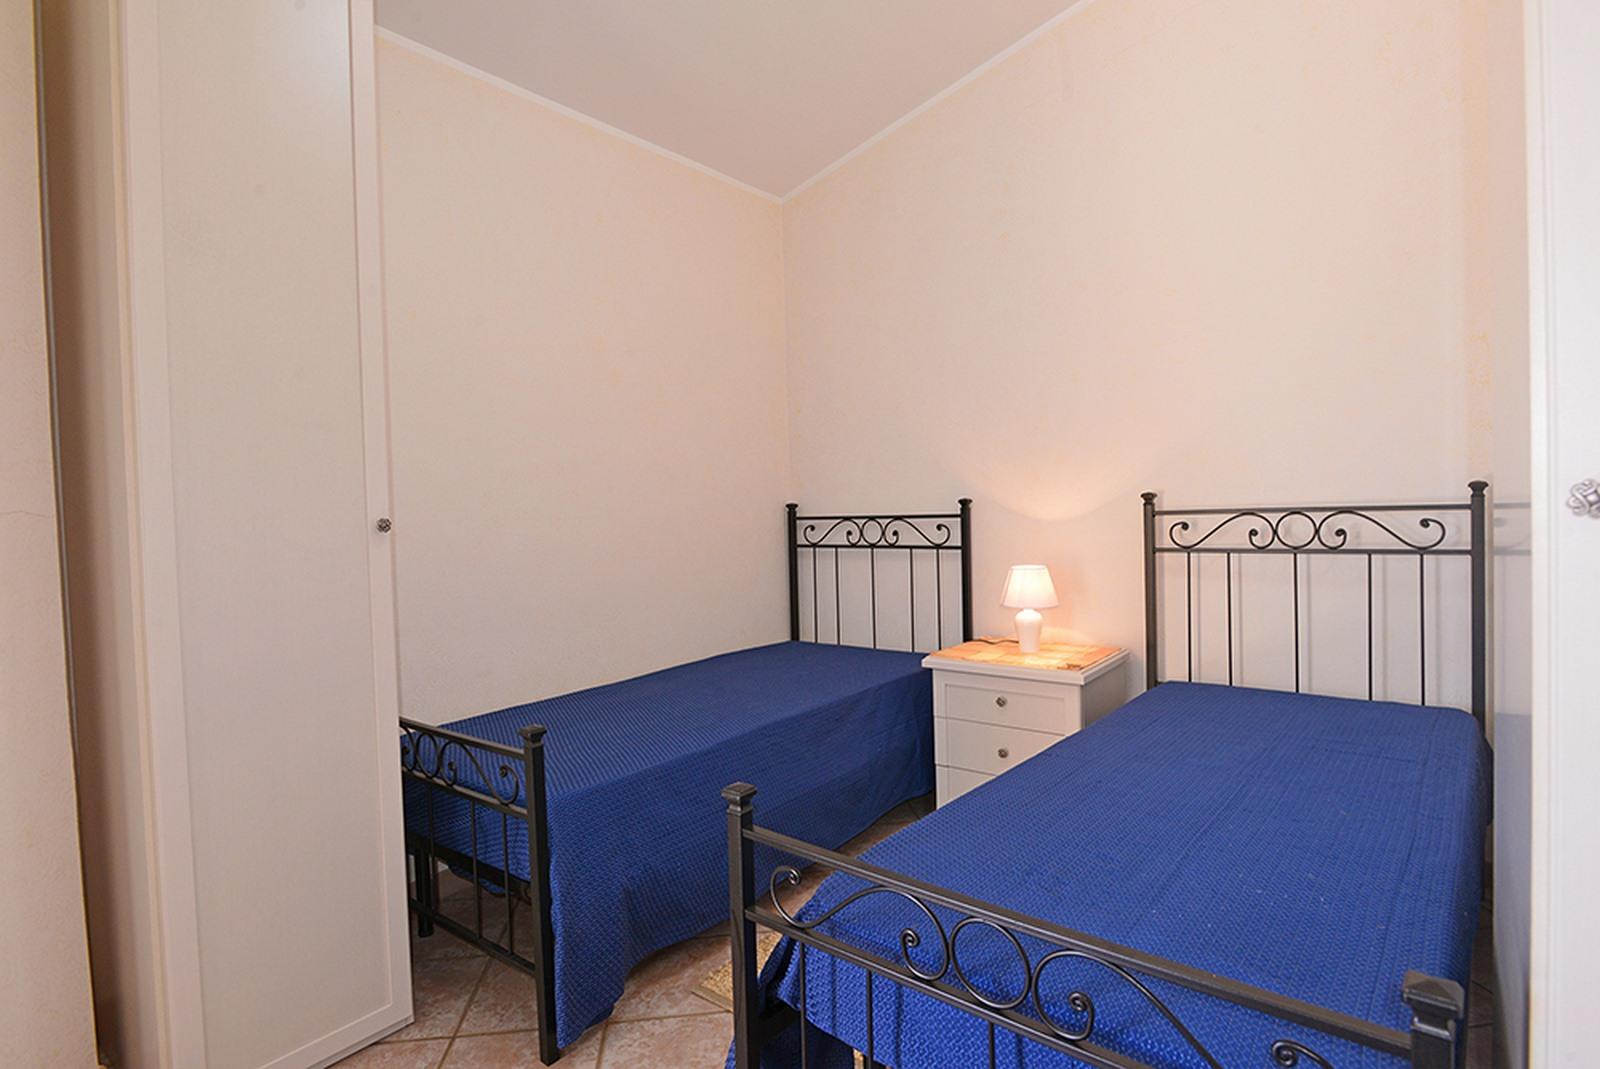 Maison de vacances Villa Paola (1041138), Floridia, Siracusa, Sicile, Italie, image 13